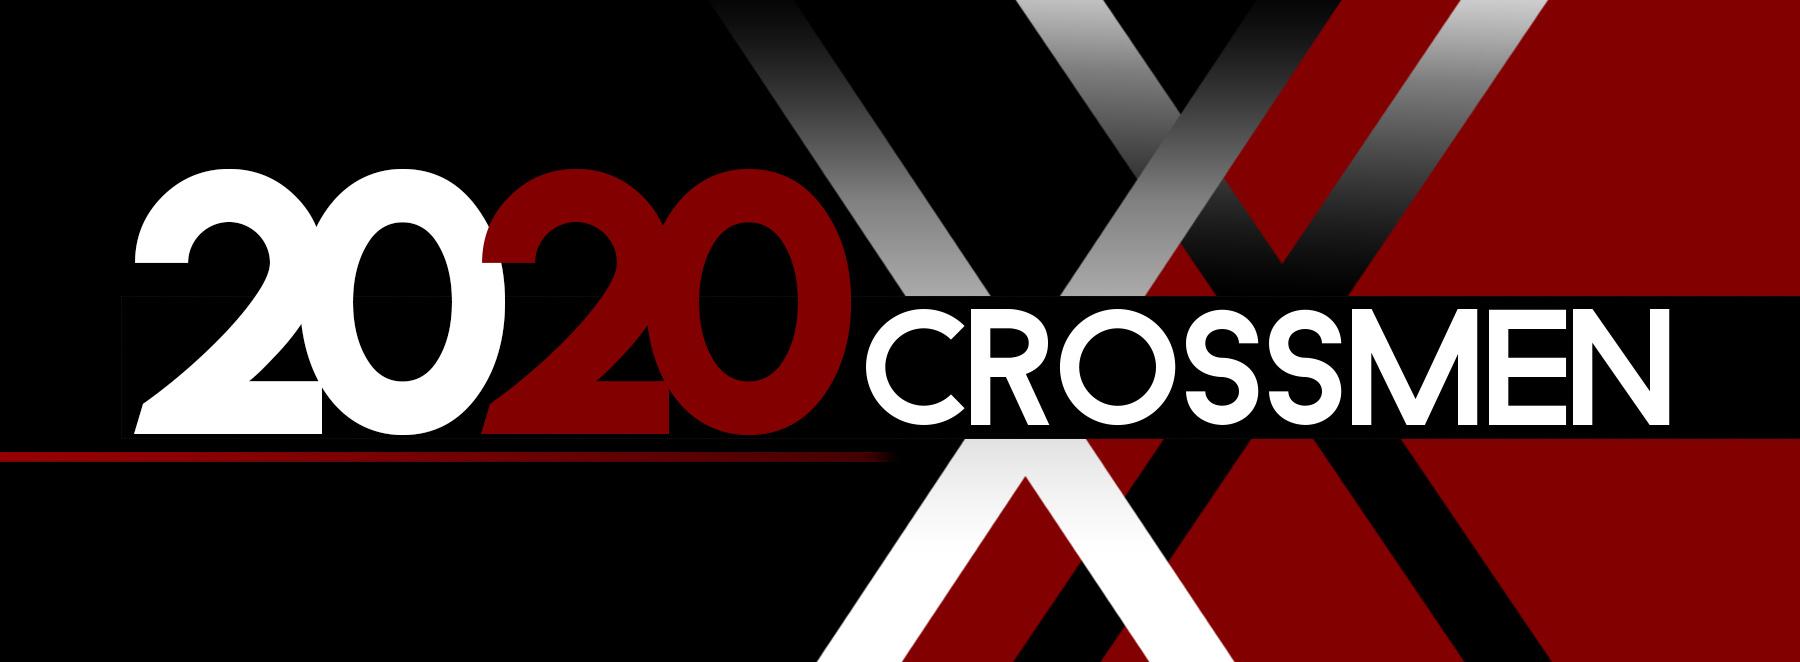 Crossmen%202020